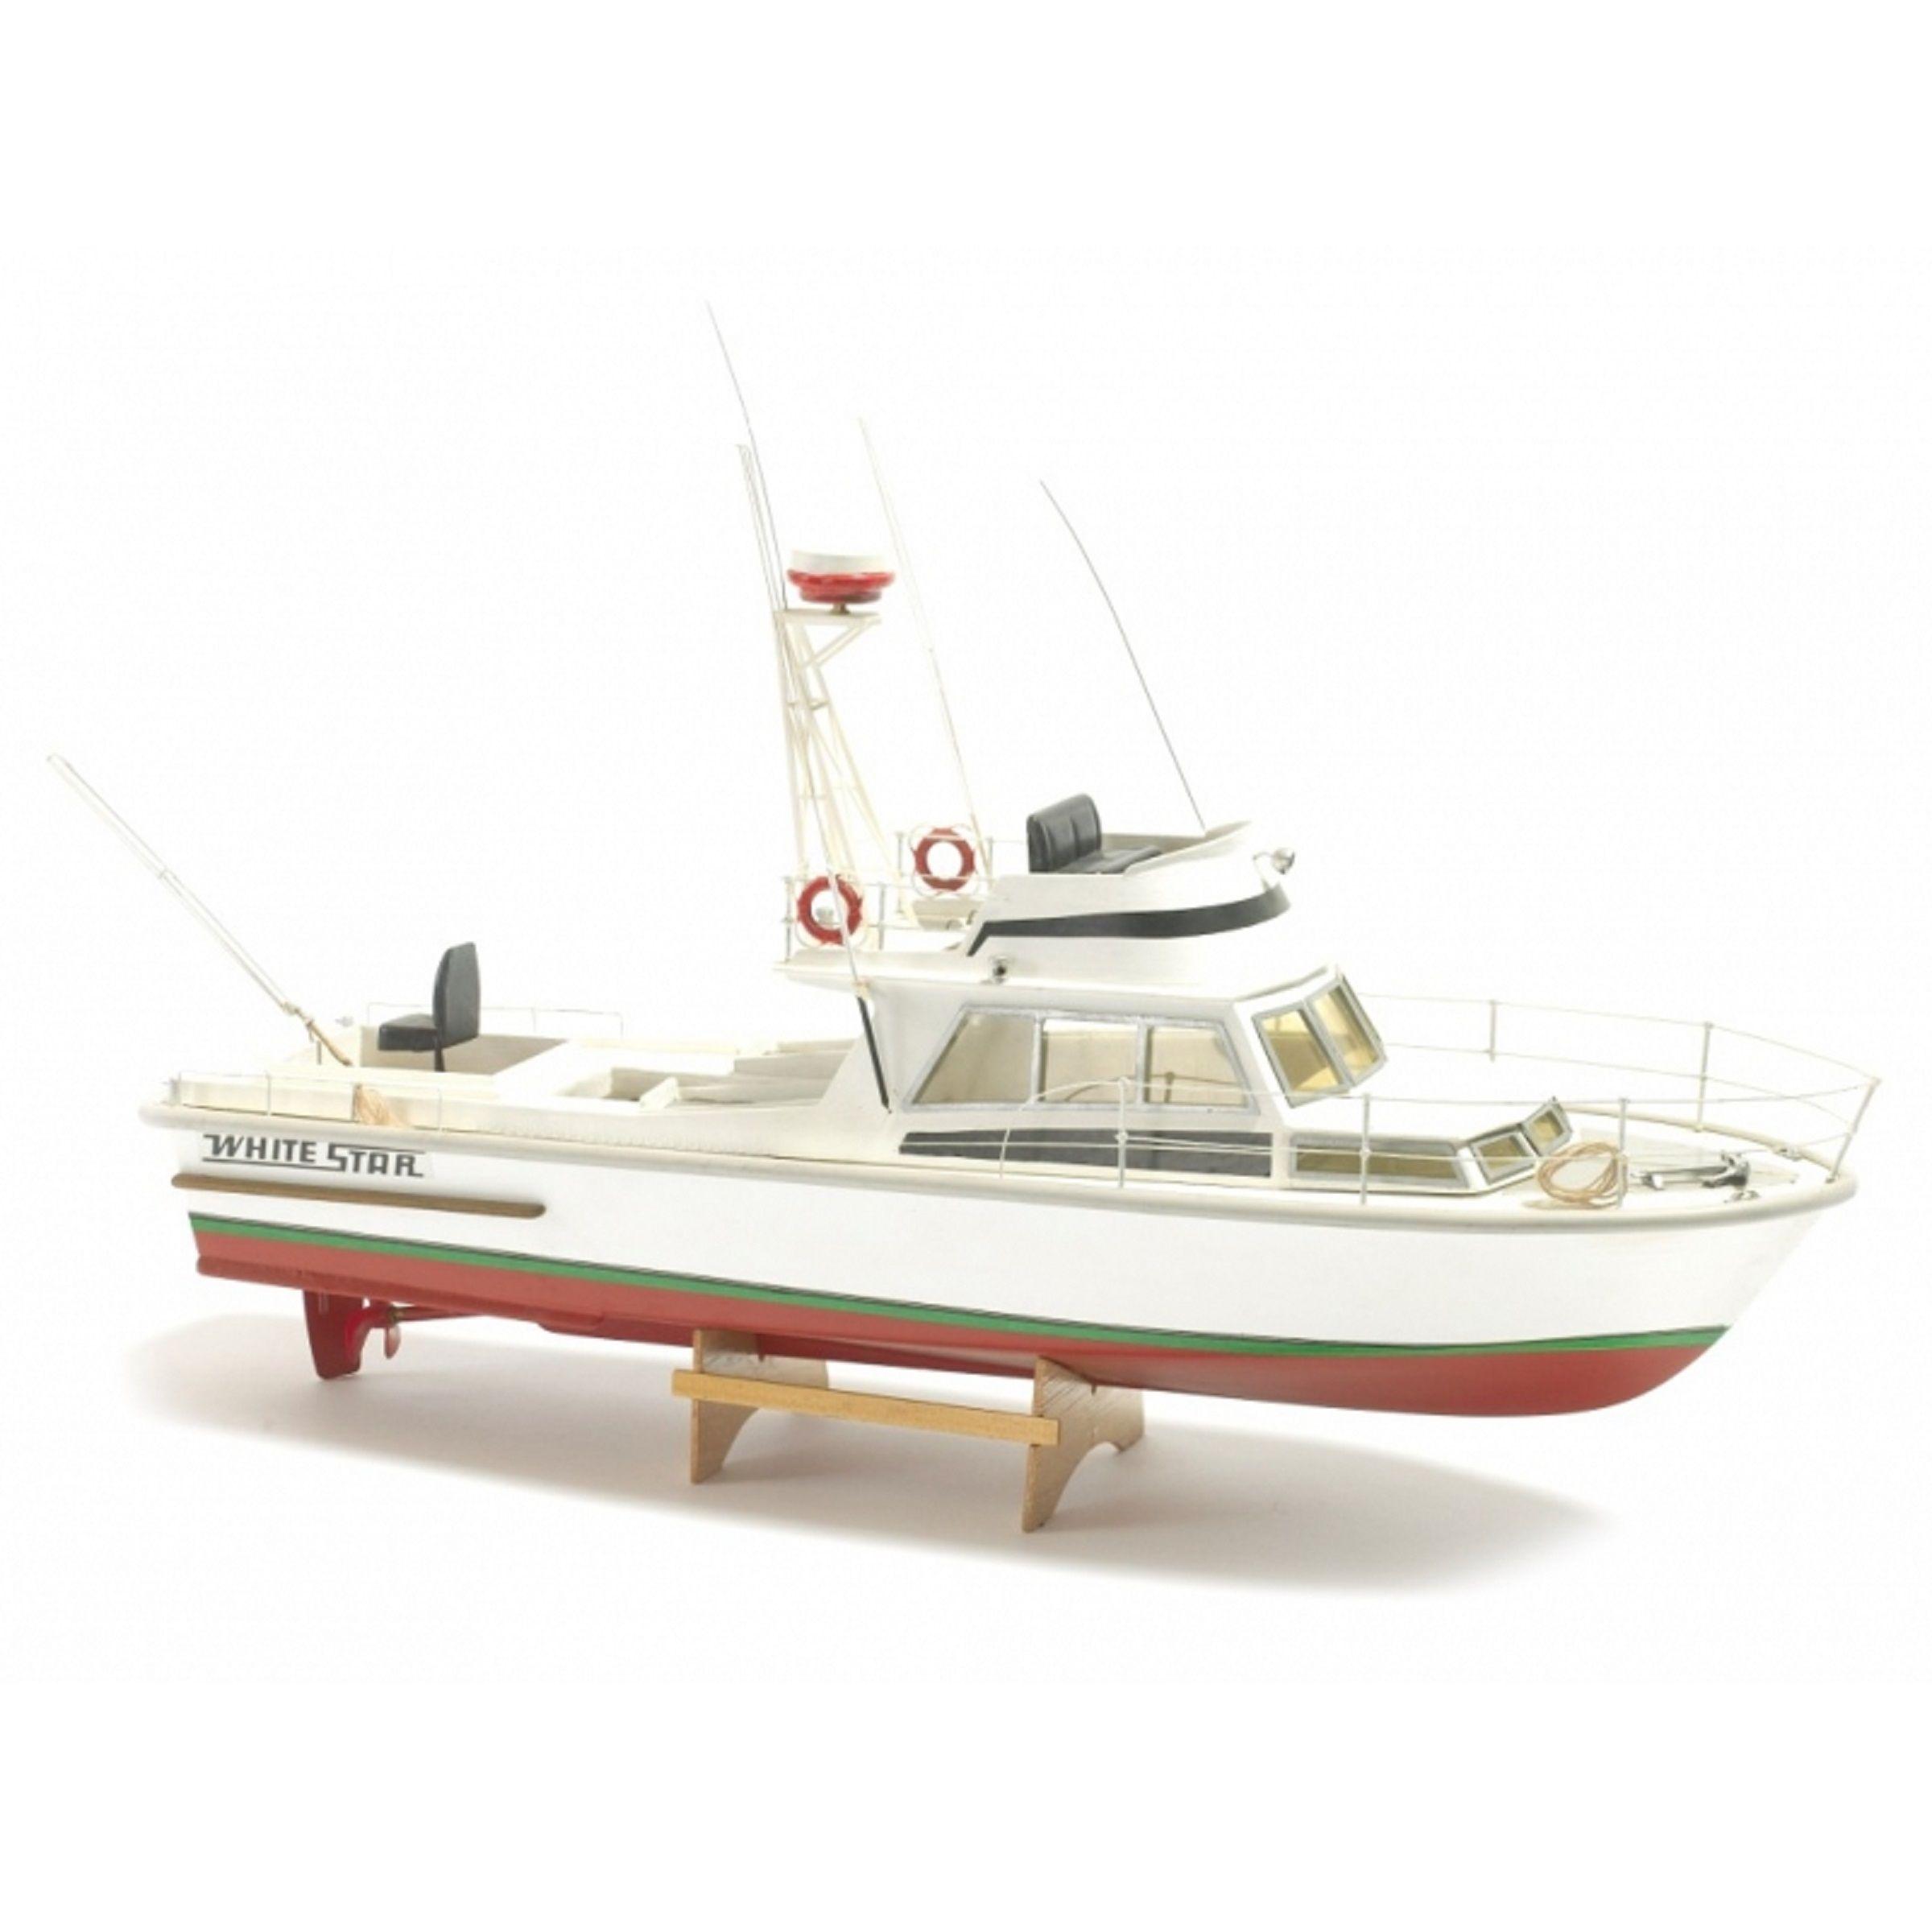 White Star Motor Boat Kit - Billing Boats (B570)